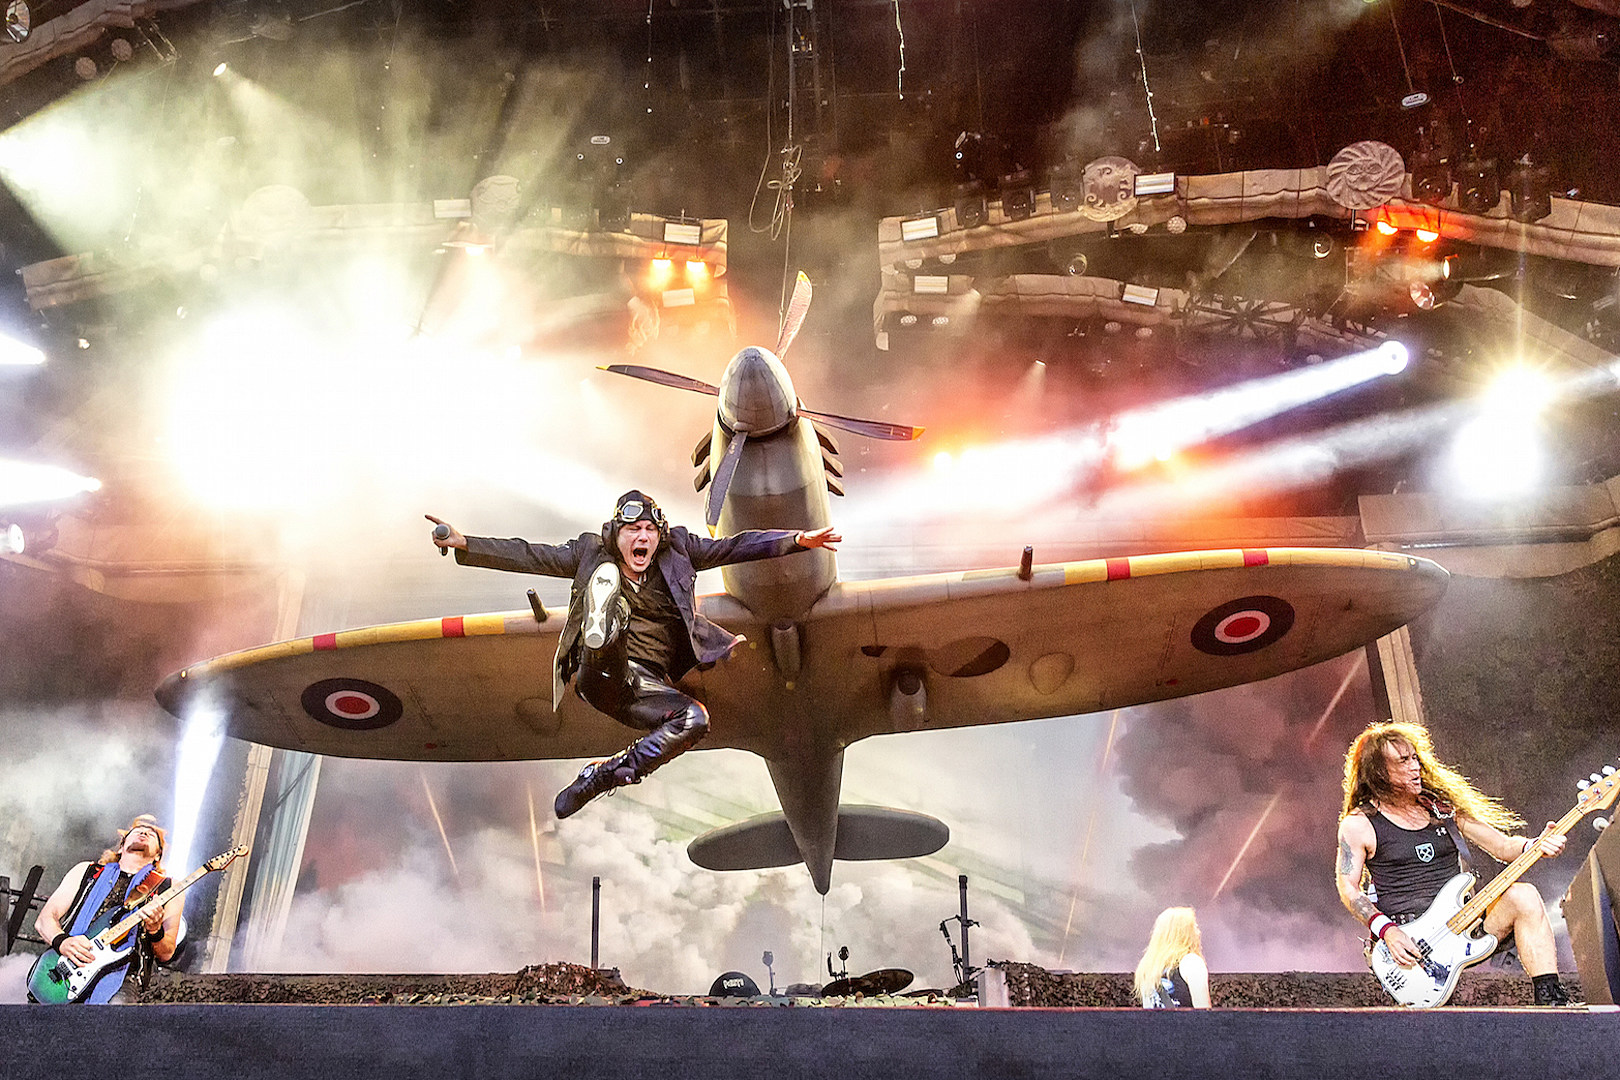 Iron Maiden Kick Off 2019 'Legacy of the Beast' Tour: Set, Video